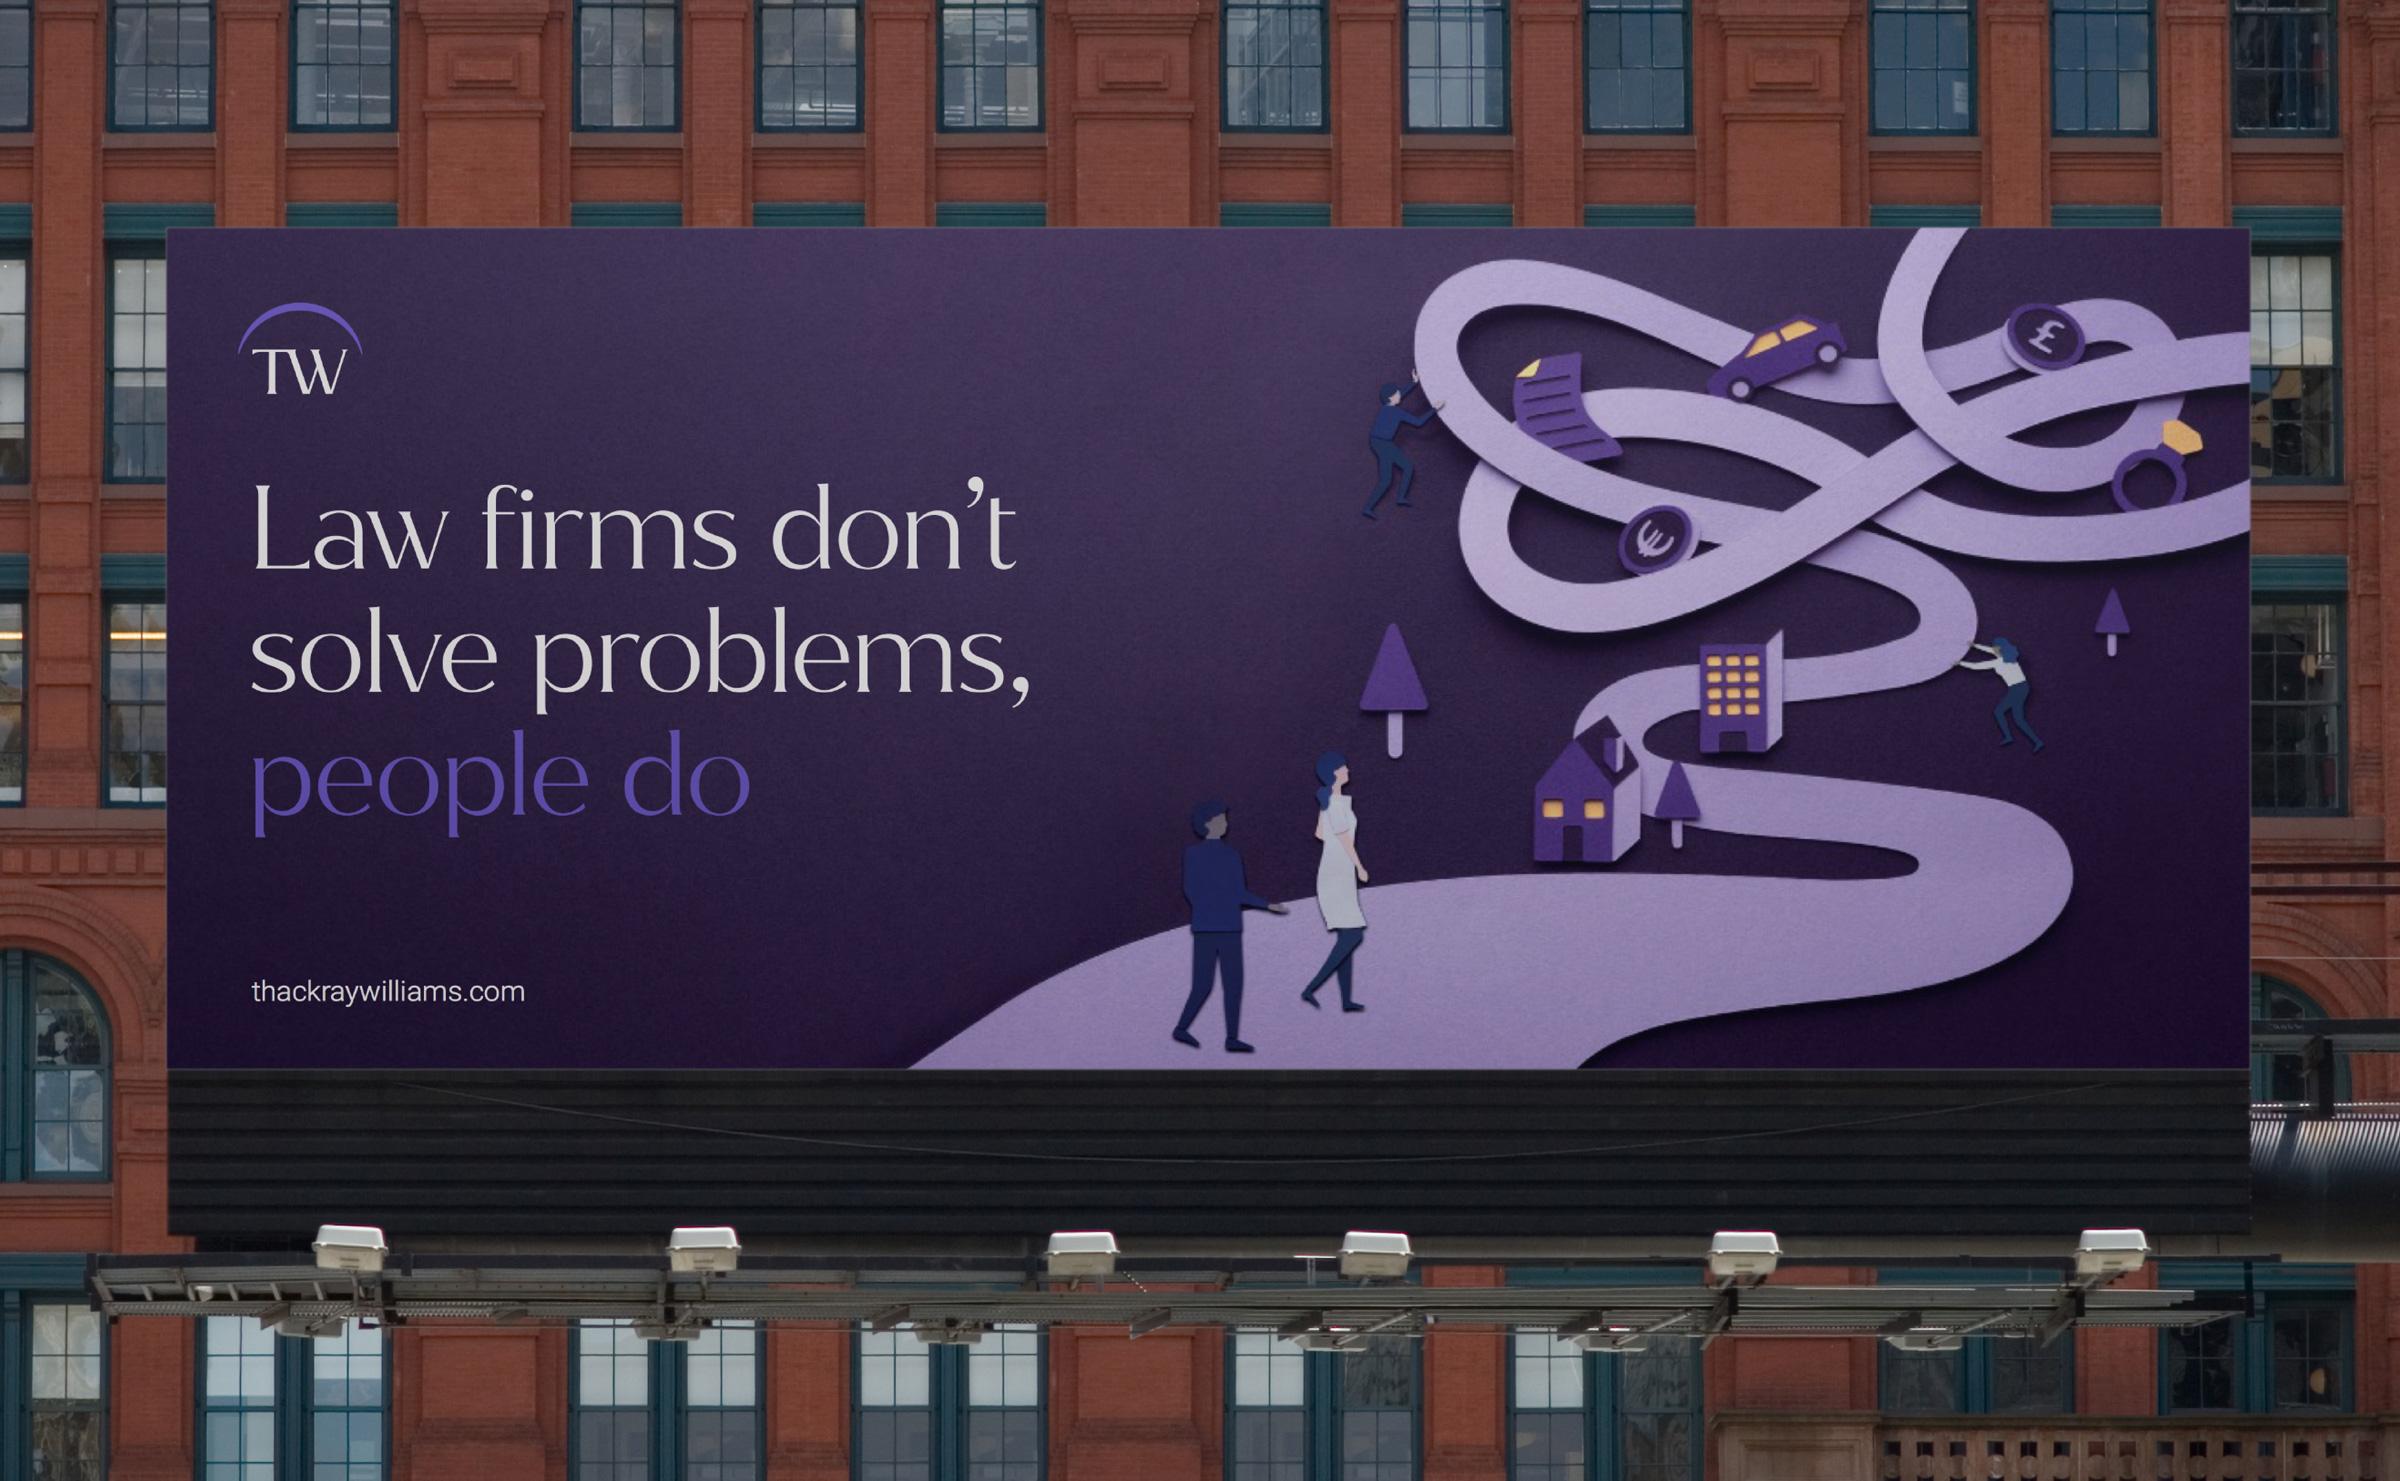 TW_billboard-ad